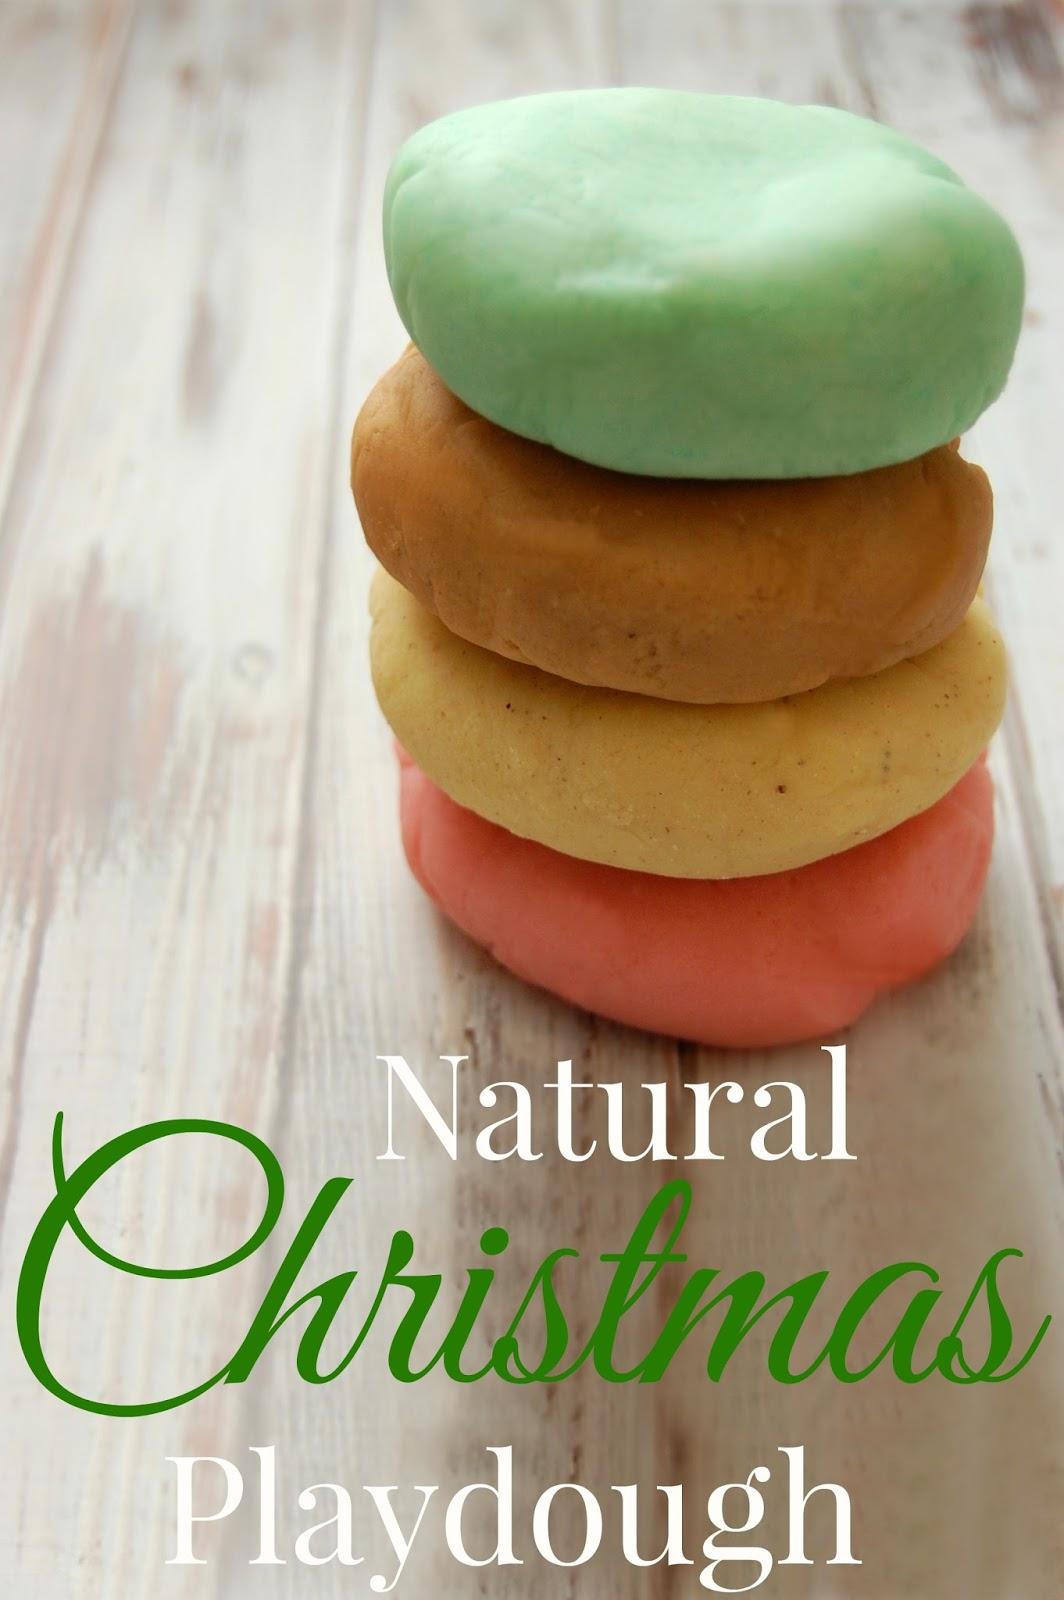 Natural Christmas Playdough - The Pistachio Project